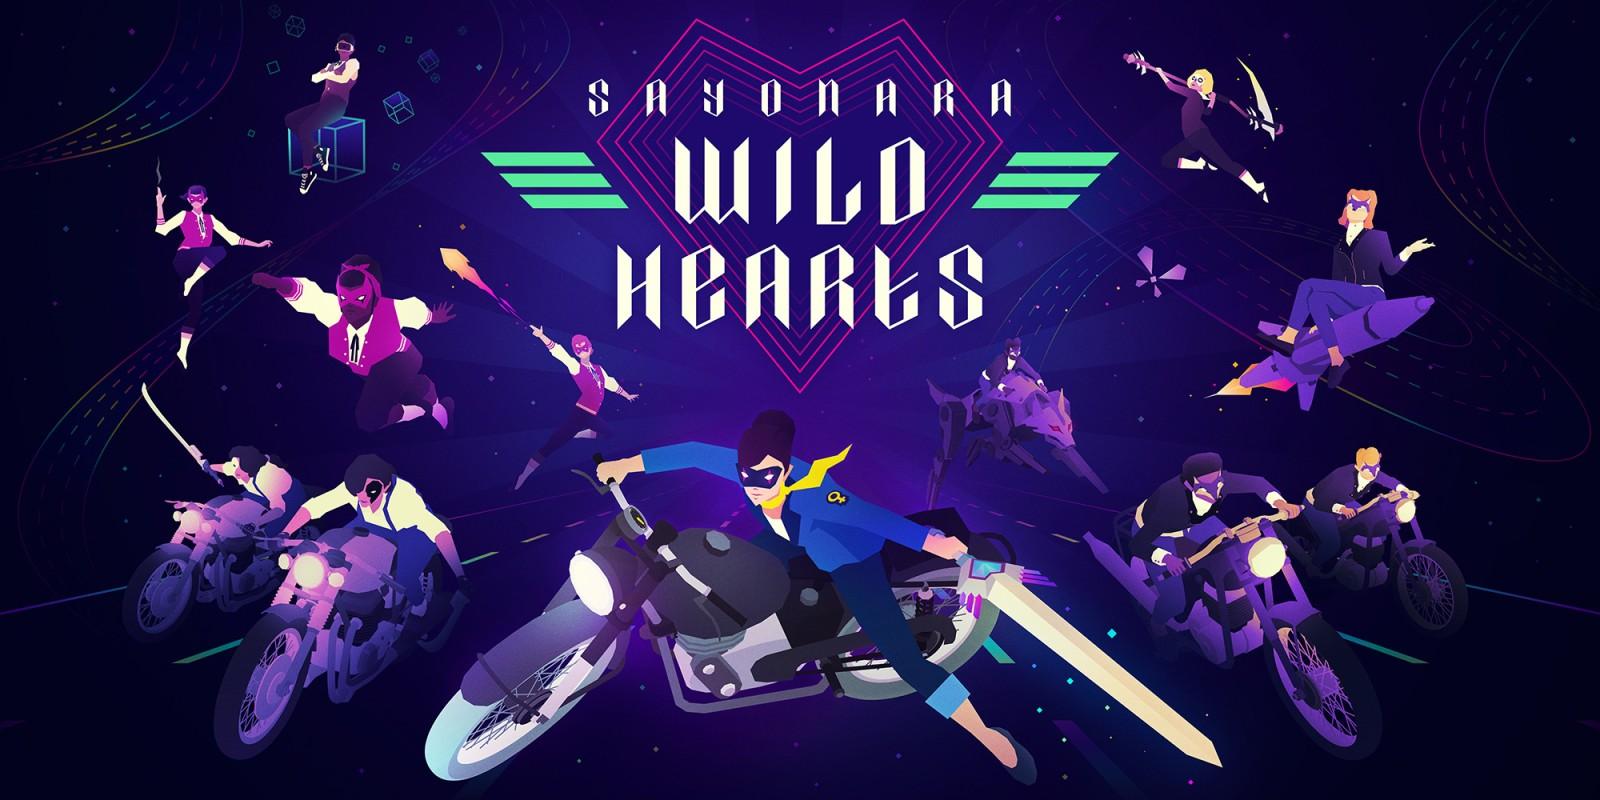 Image result for sayonara wild hearts